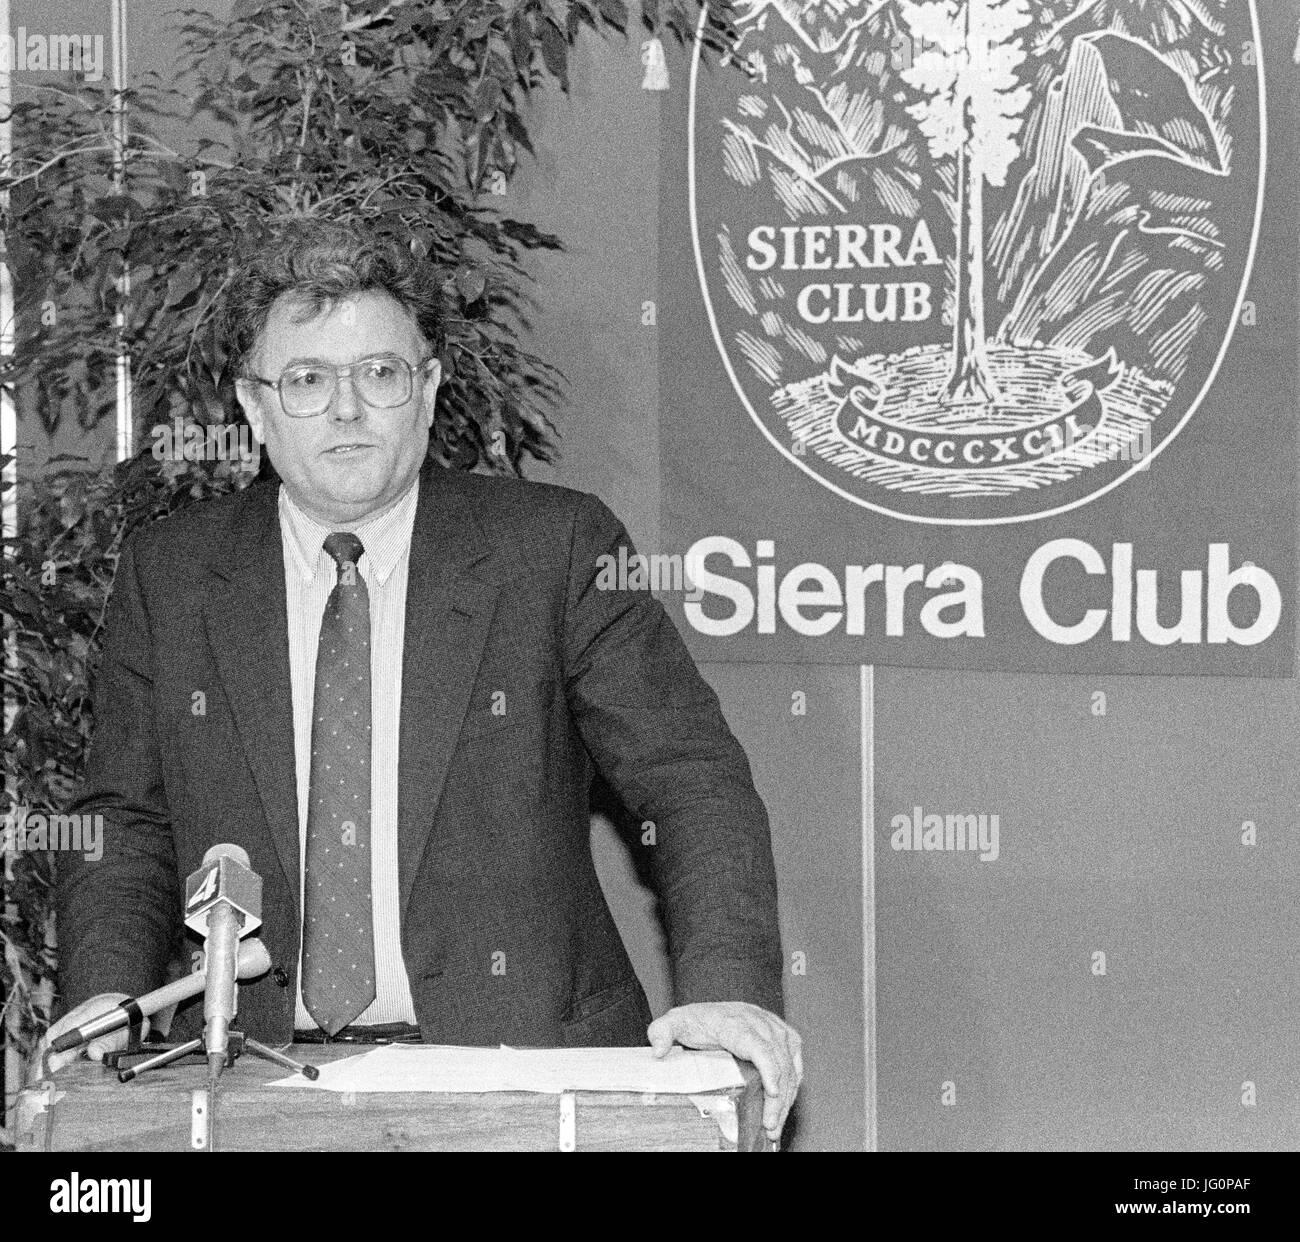 Harry Britt, former San Francisco Supervisor succeeding Harvey Milk. Speaking at the Sierra Club. - Stock Image